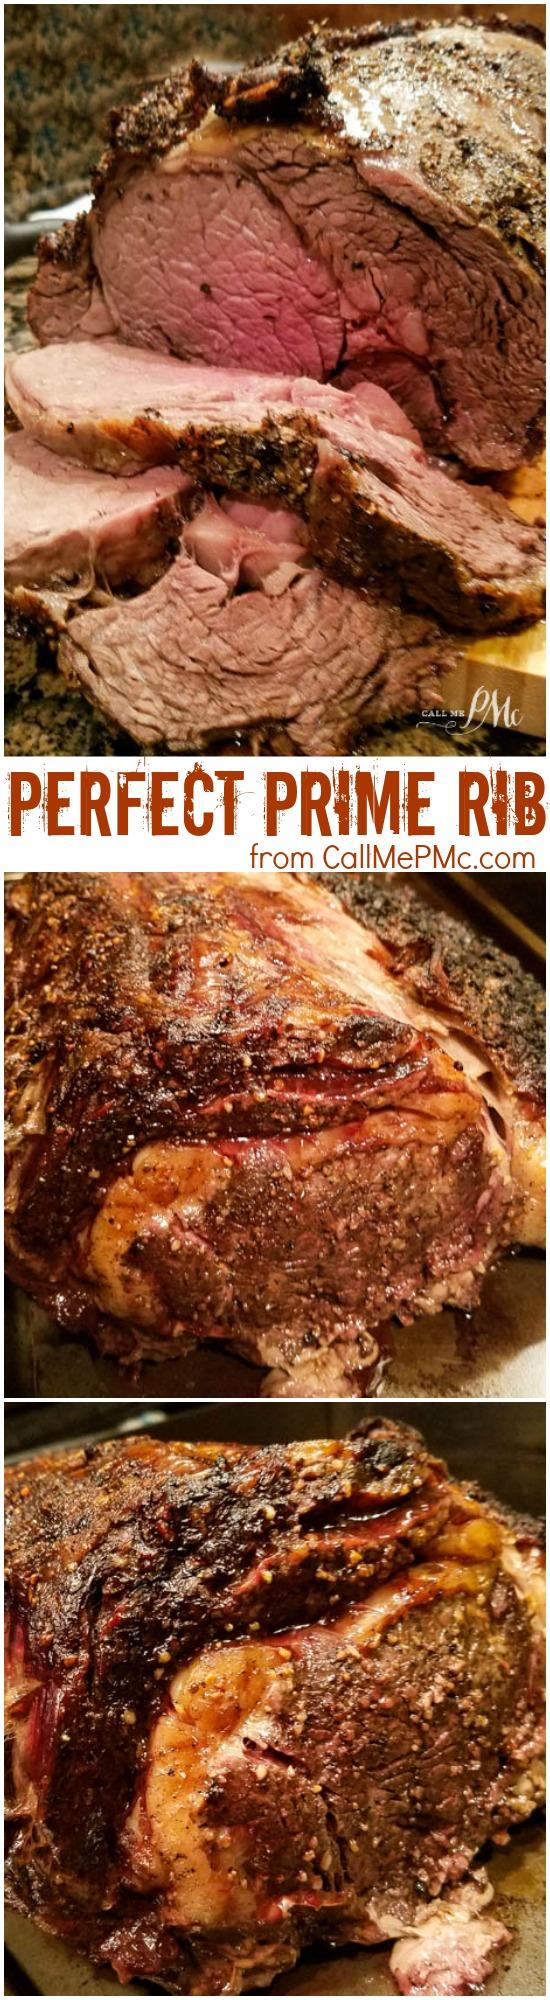 Perfect Prime Rib Medium Rare Oven Cooked recipe